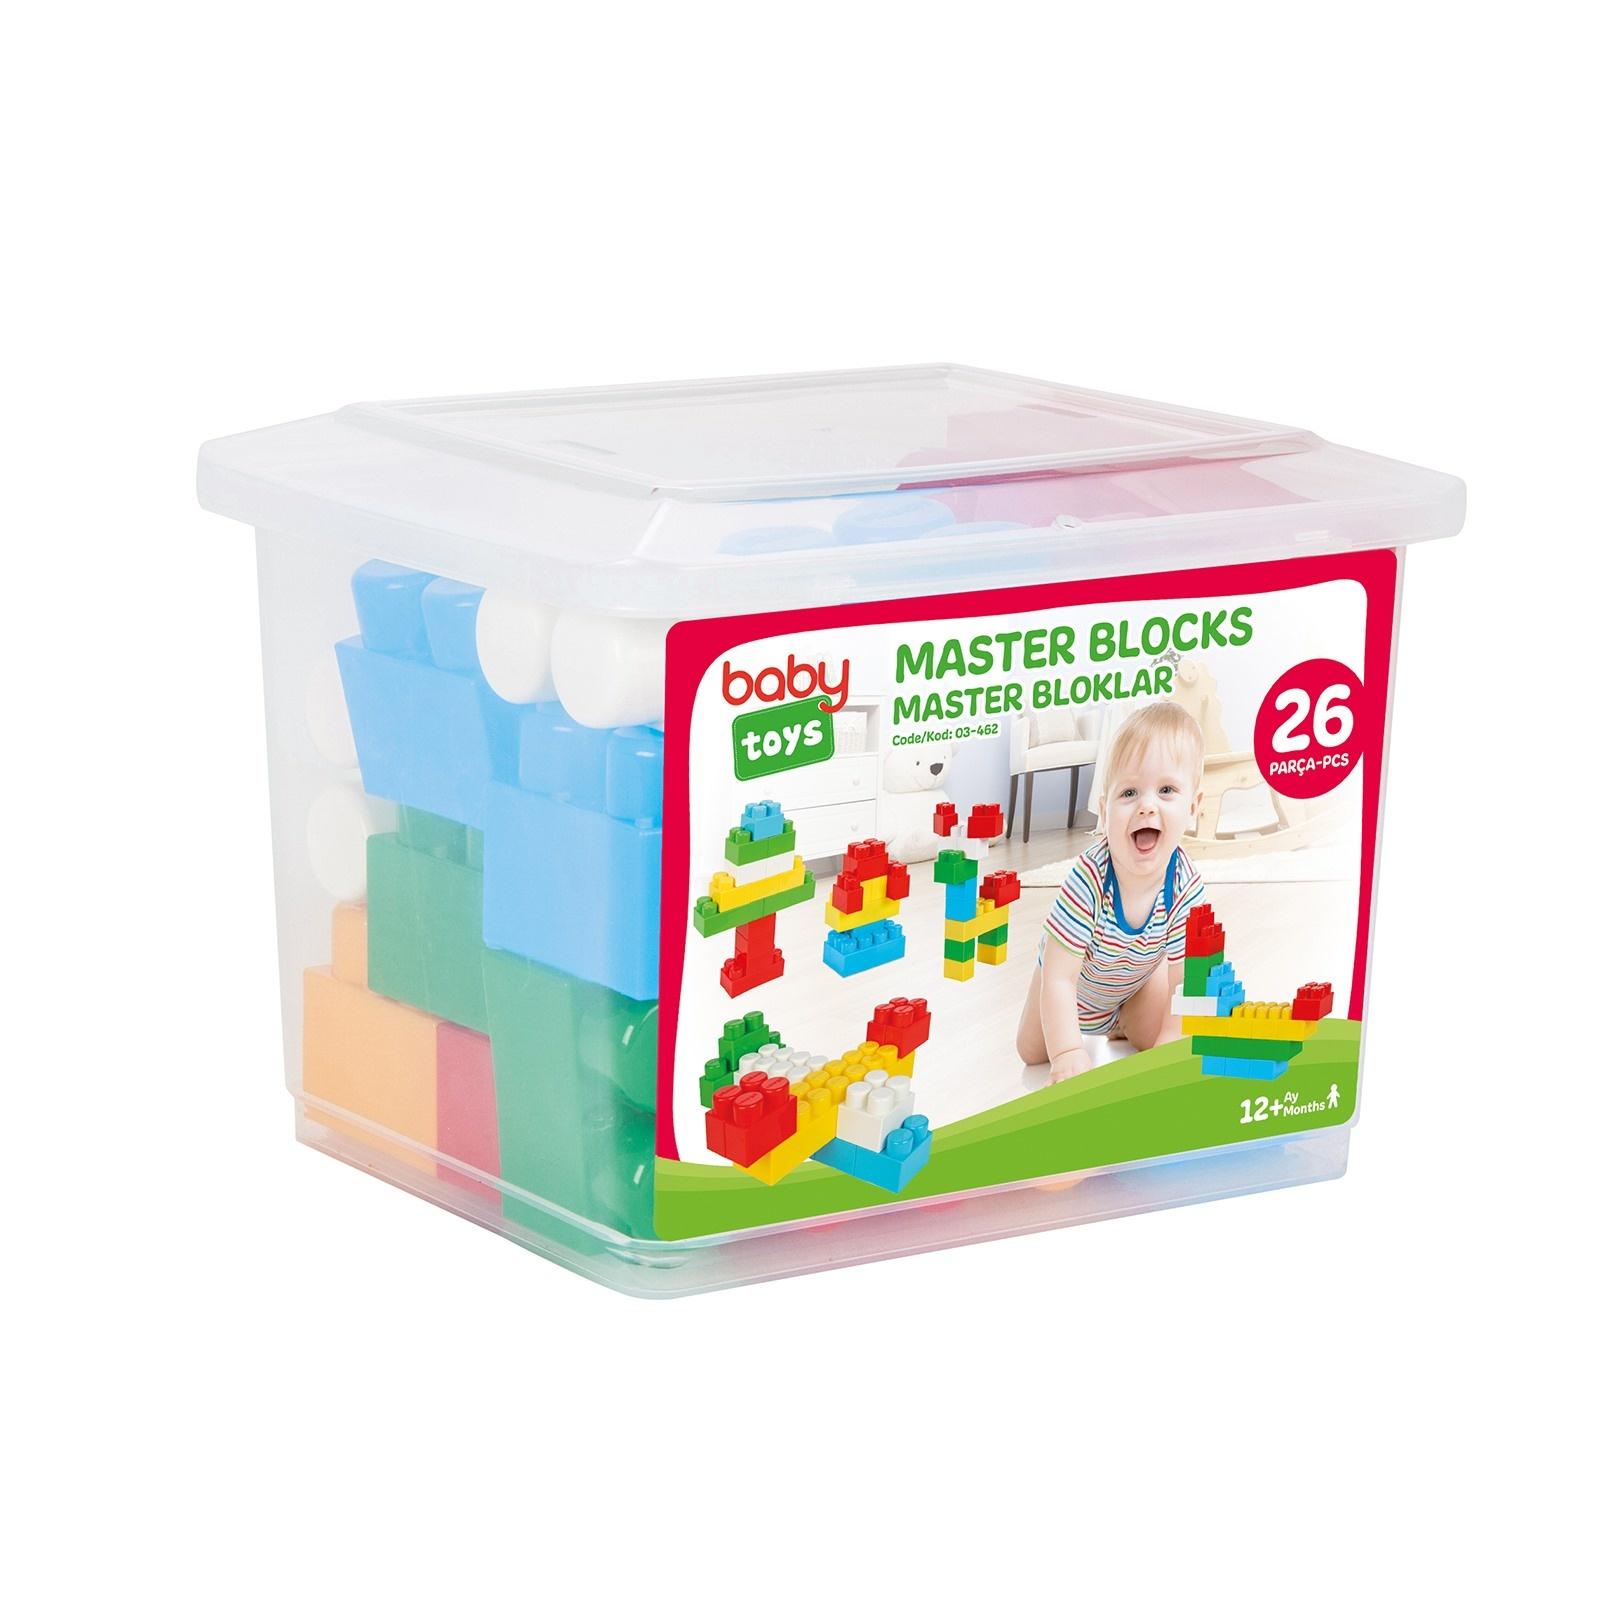 Baby Blocks Toys : Baby toys master blocks pieces